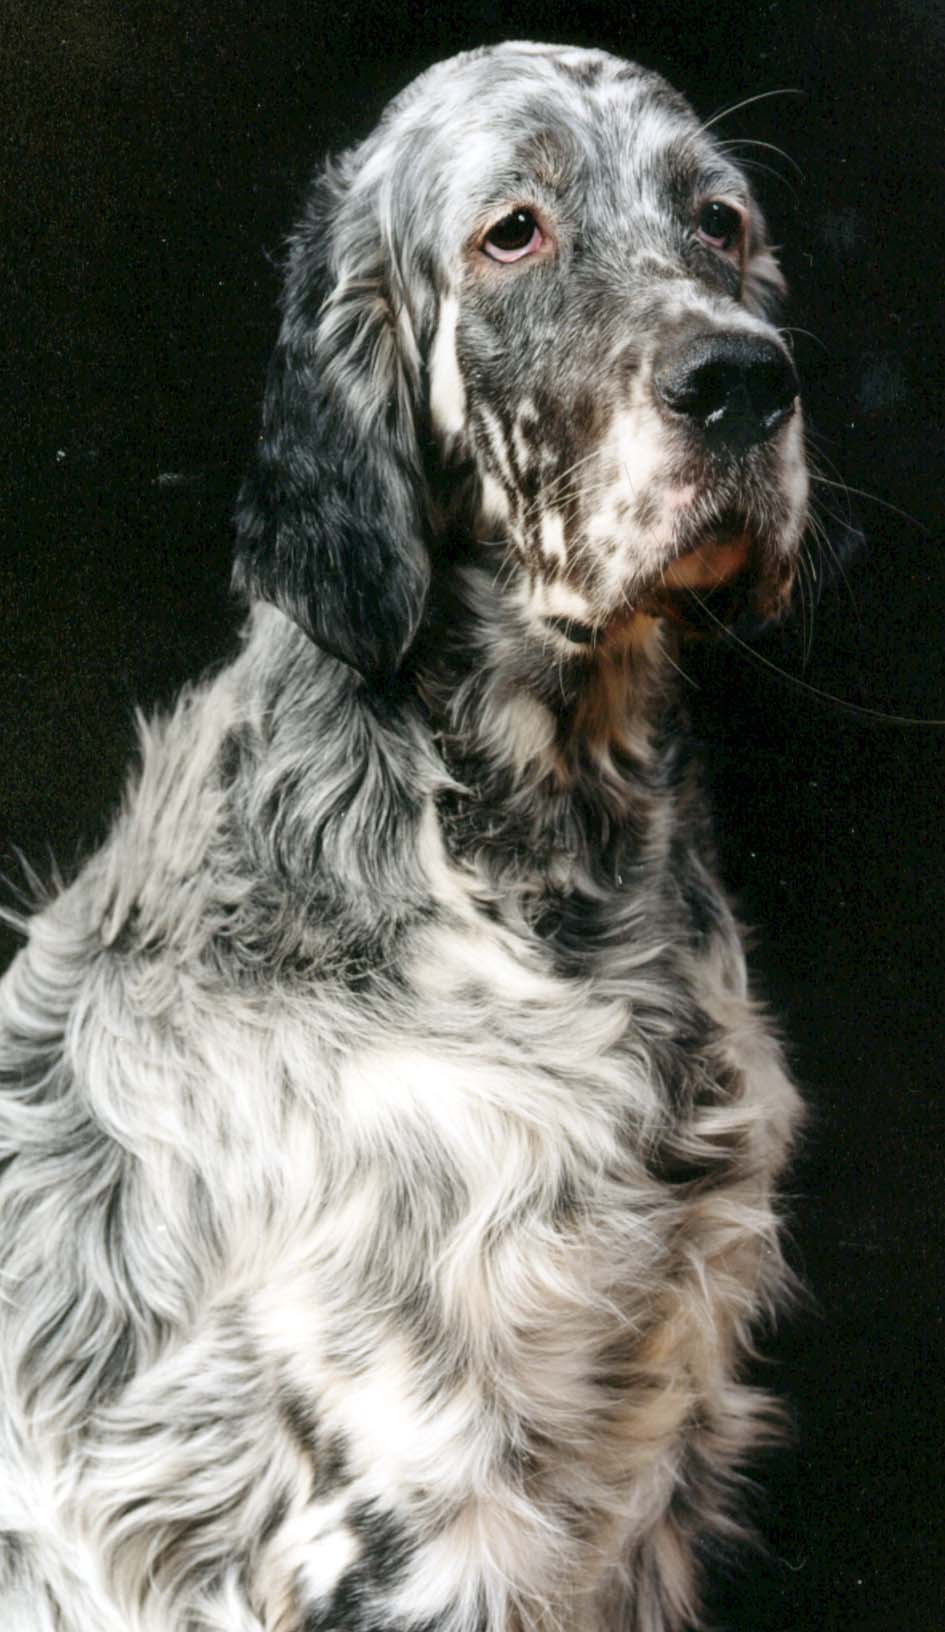 Www Cute Puppies Wallpaper Com Sad English Setter Dog Photo And Wallpaper Beautiful Sad